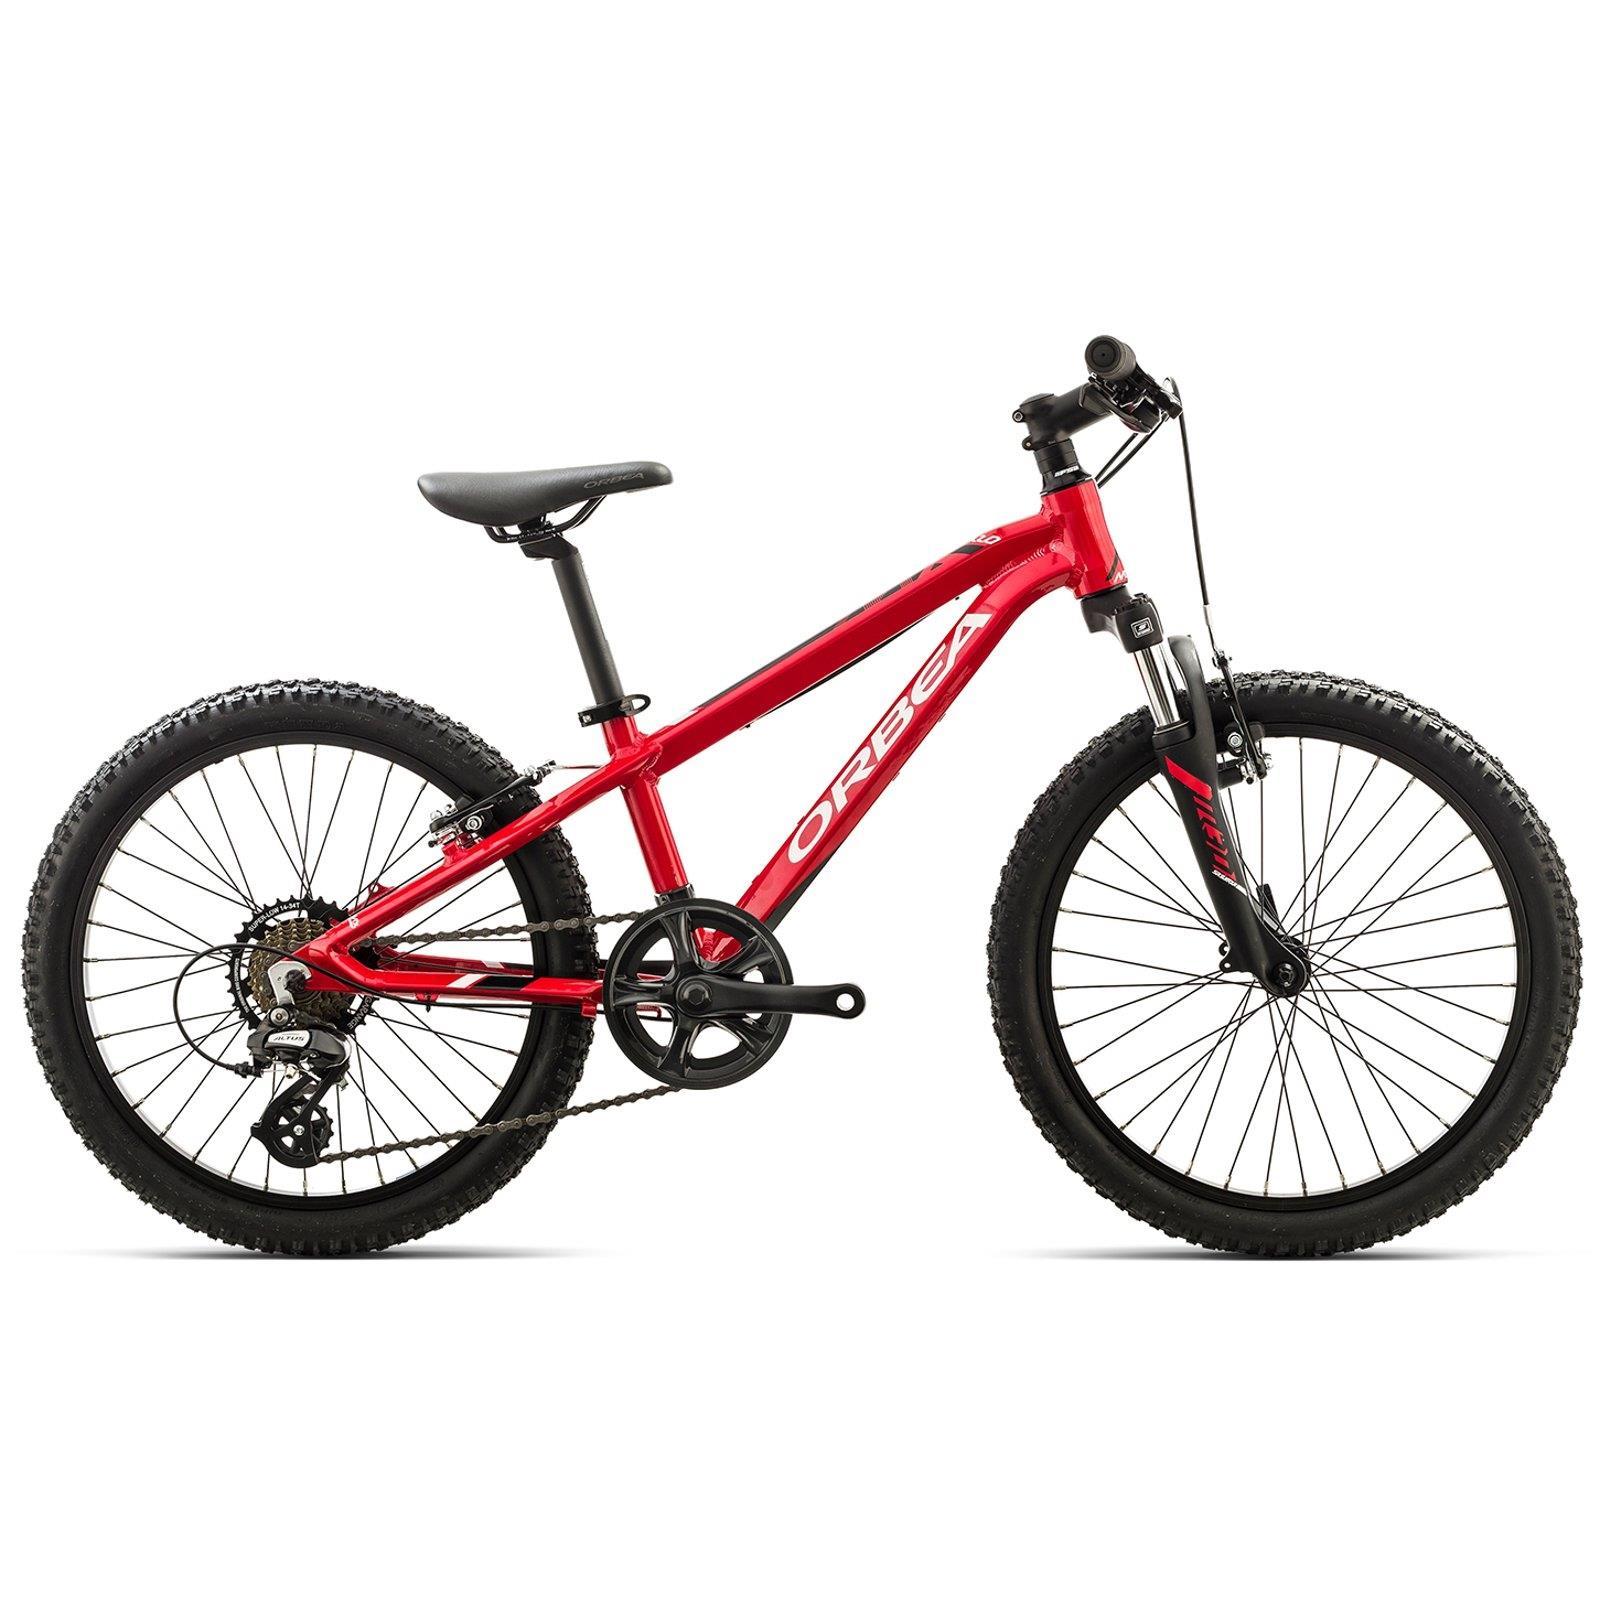 orbea mx 20 xc kinder fahrrad 20 zoll 7 gang mtb rad. Black Bedroom Furniture Sets. Home Design Ideas